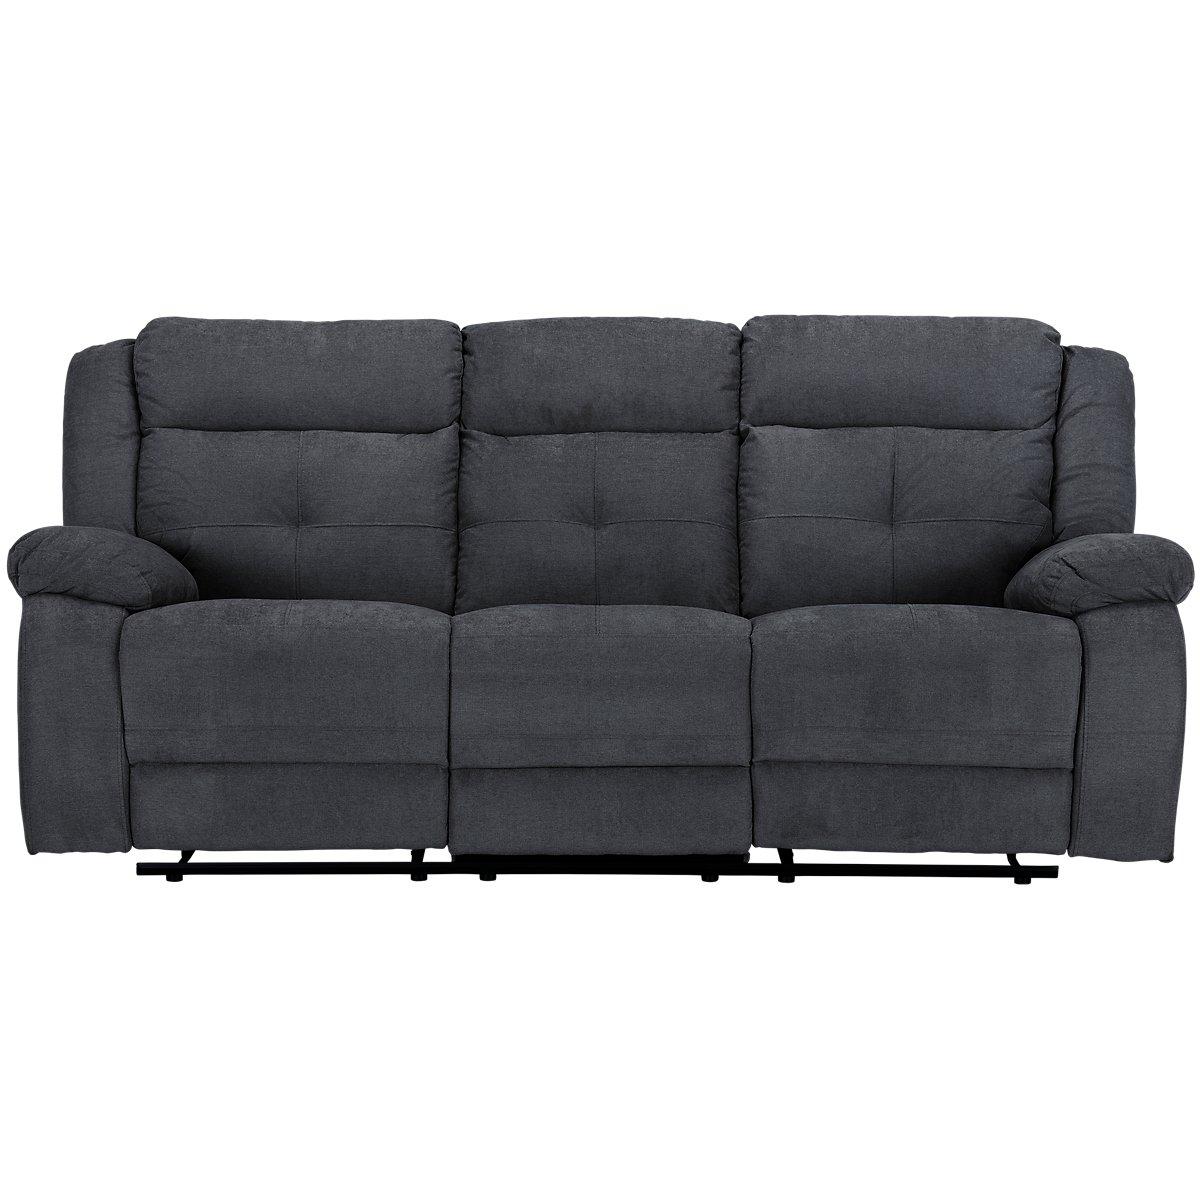 City Furniture Pierce Dark Gray Microfiber Power Reclining Sofa